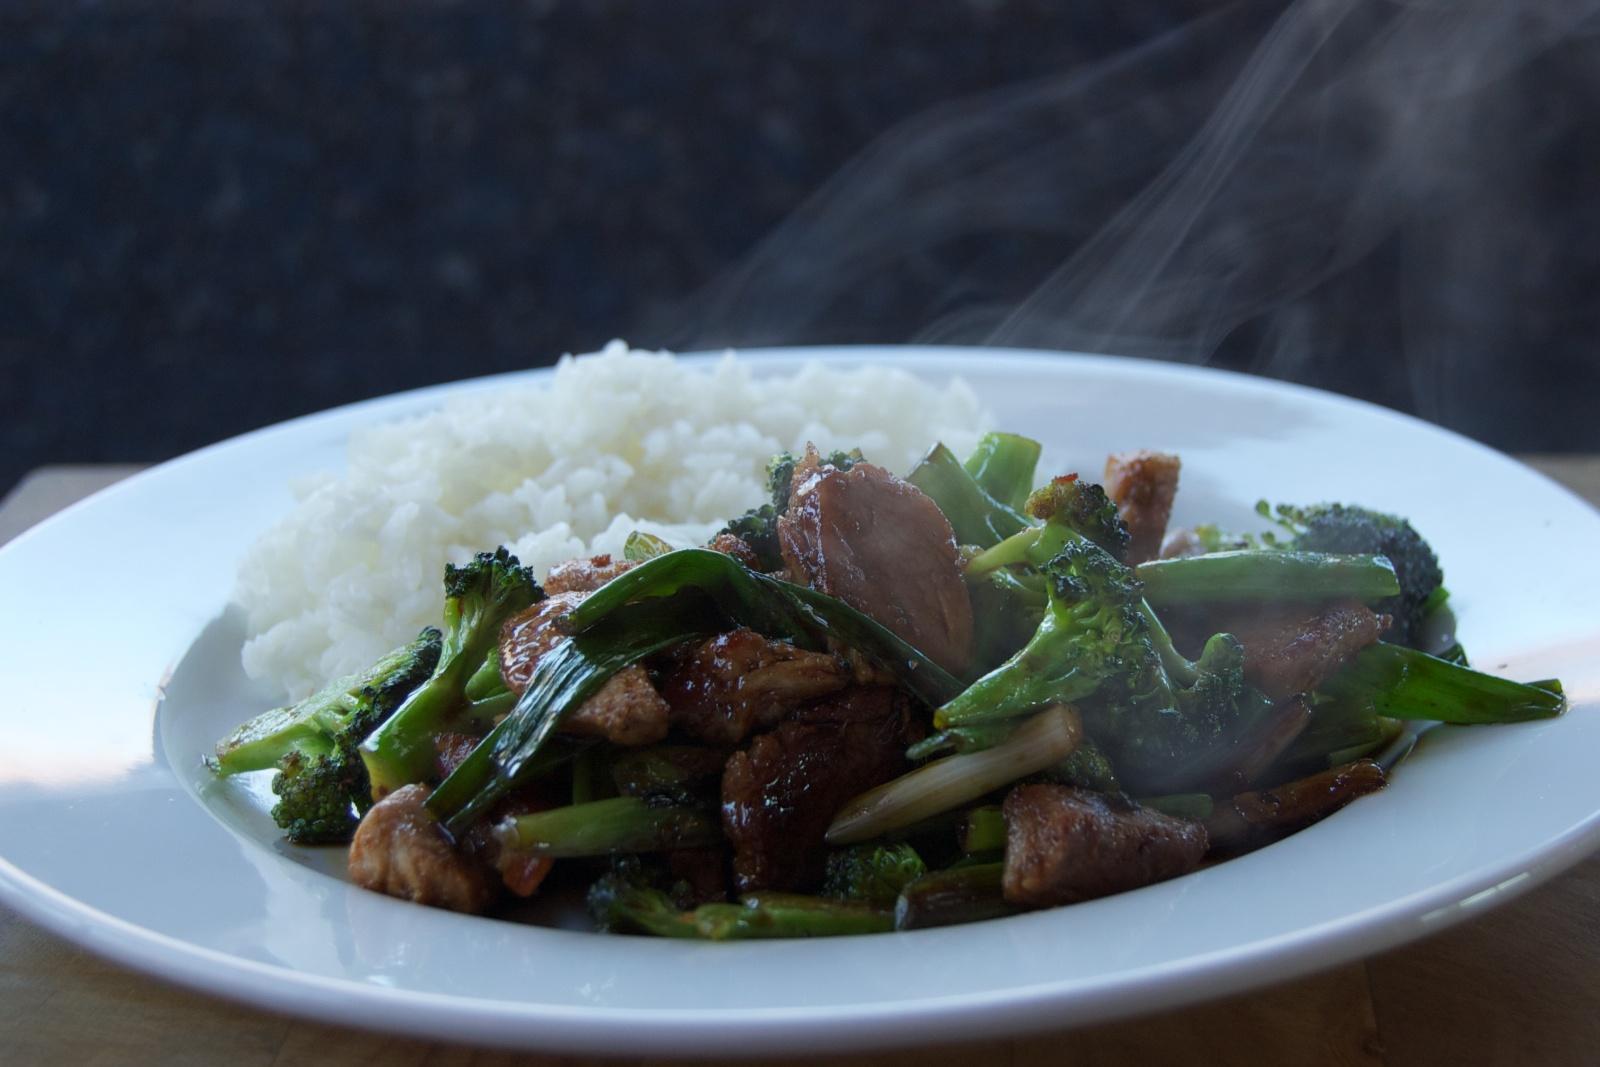 http://blog.rickk.com/food/2014/02/28/ate.2013.02.28.d.jpg